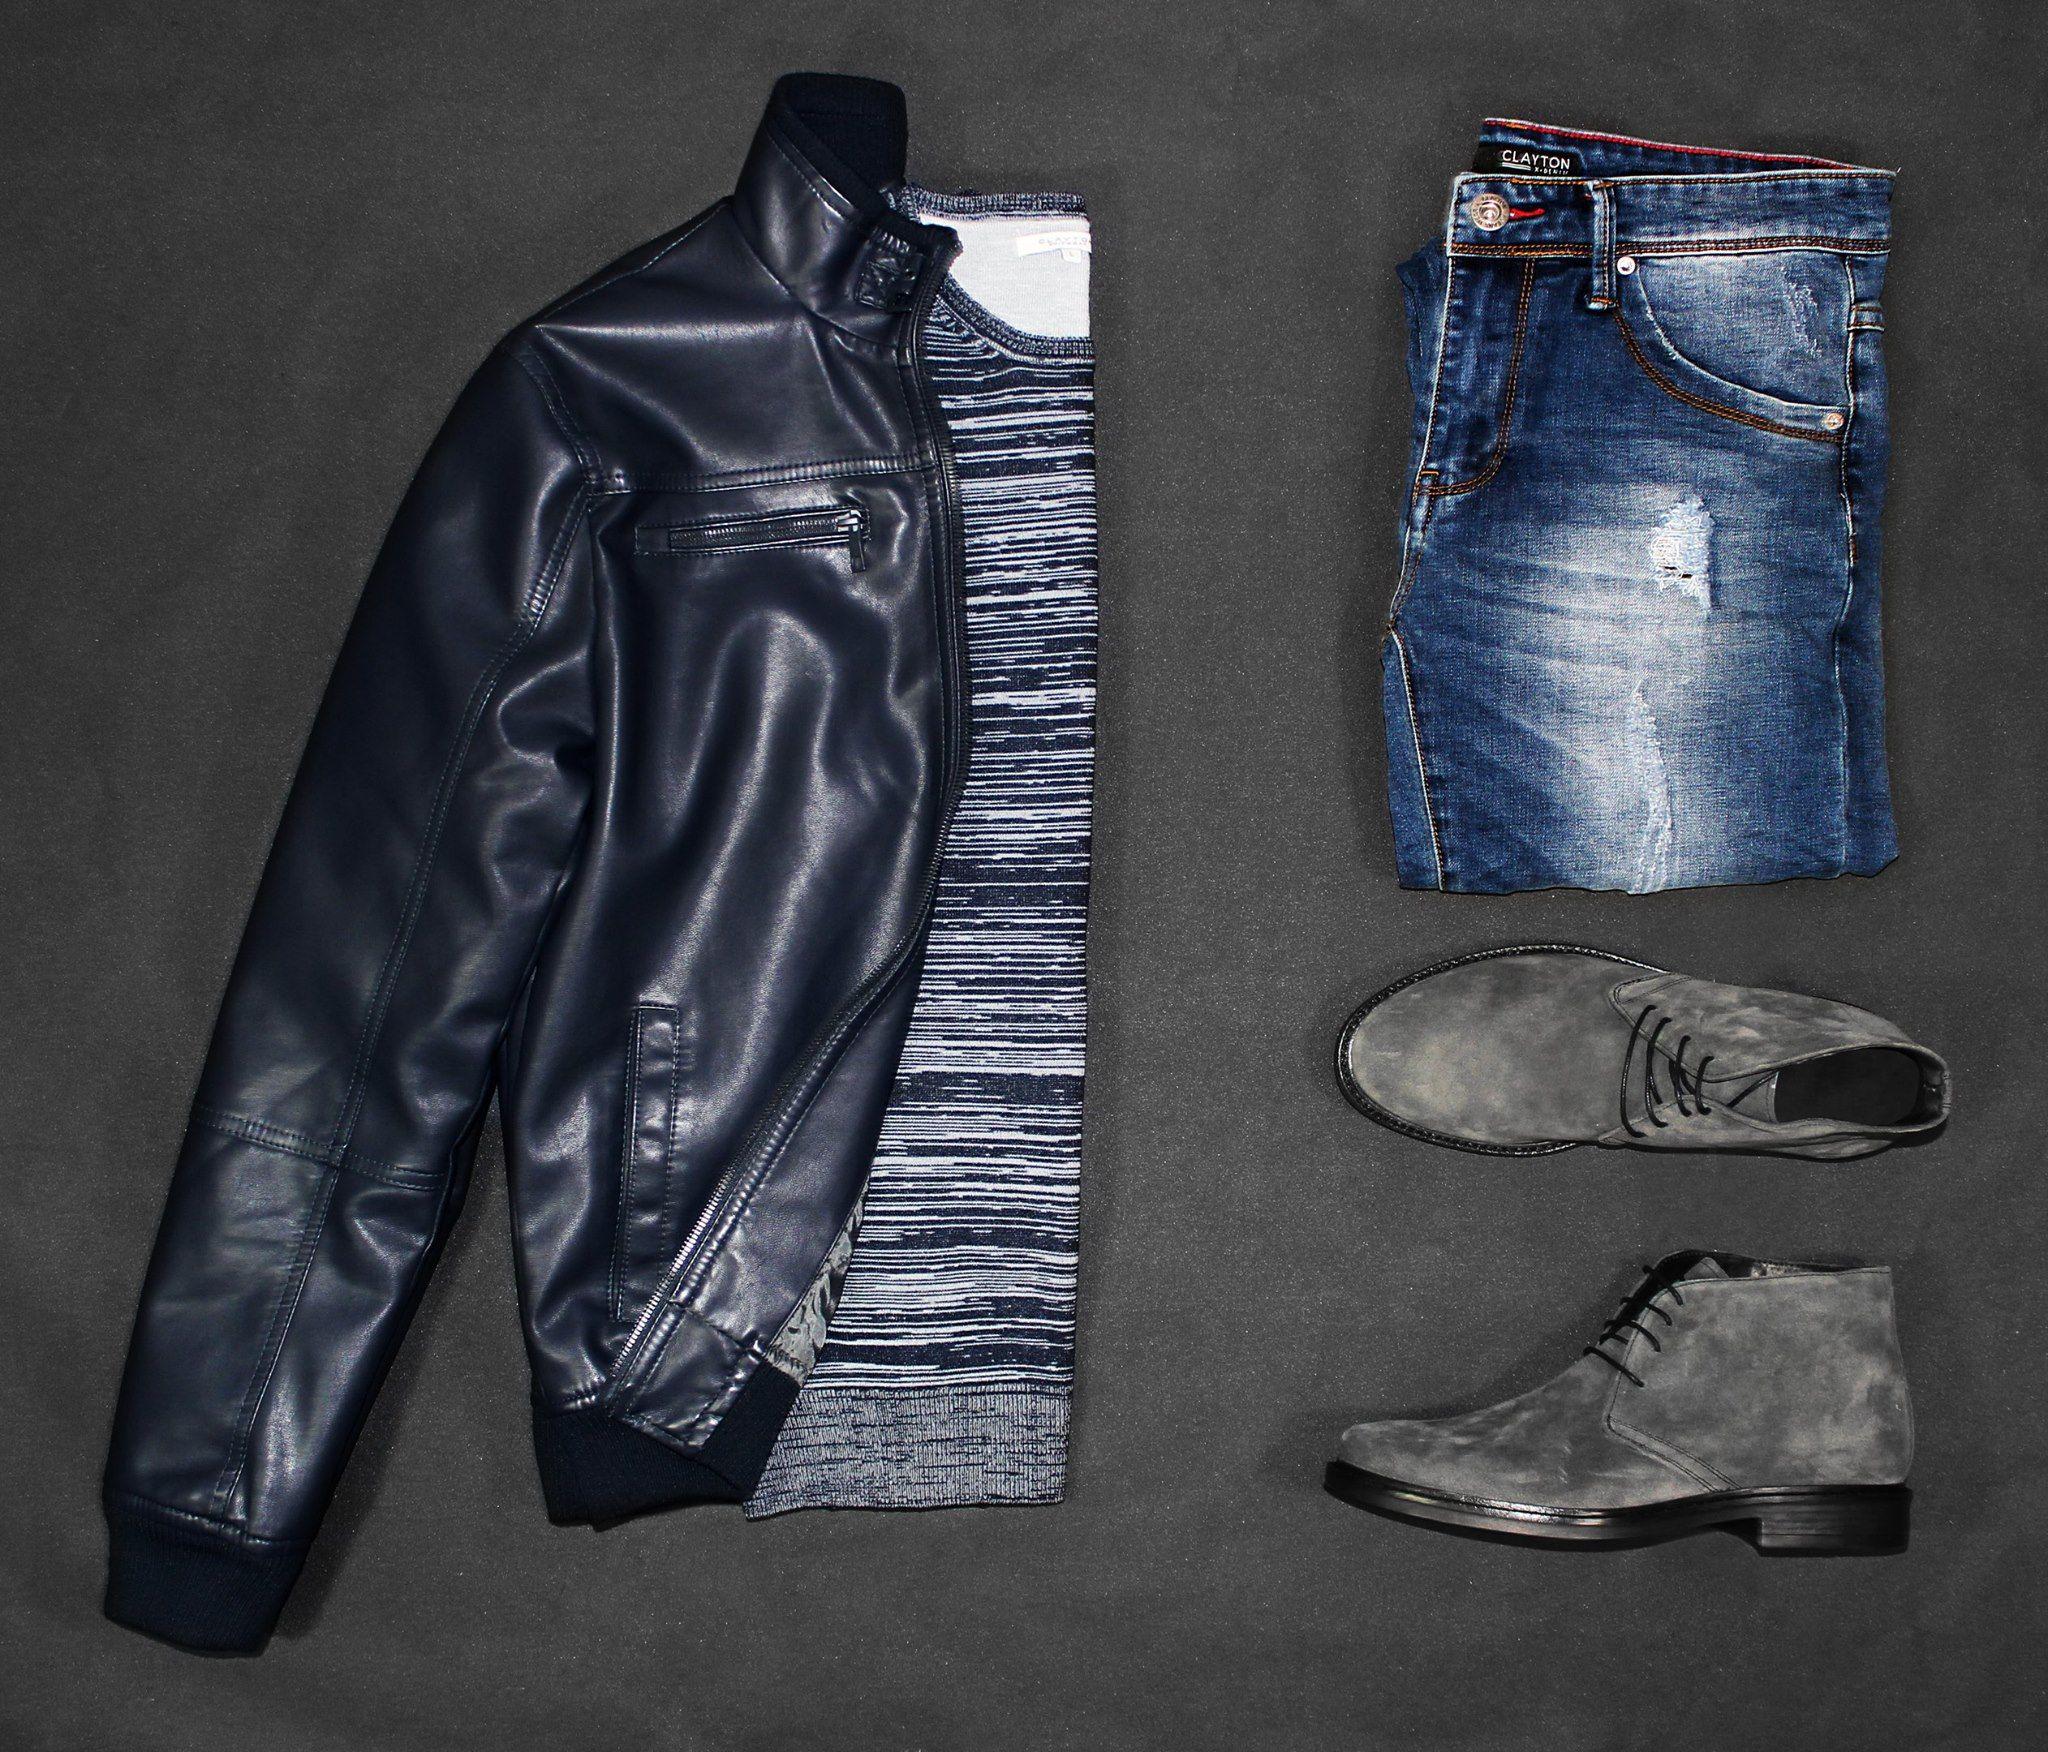 new arrival a4c9c 419e9 outfitgrid claytonitalia menswear clothes: denim, jeans ...